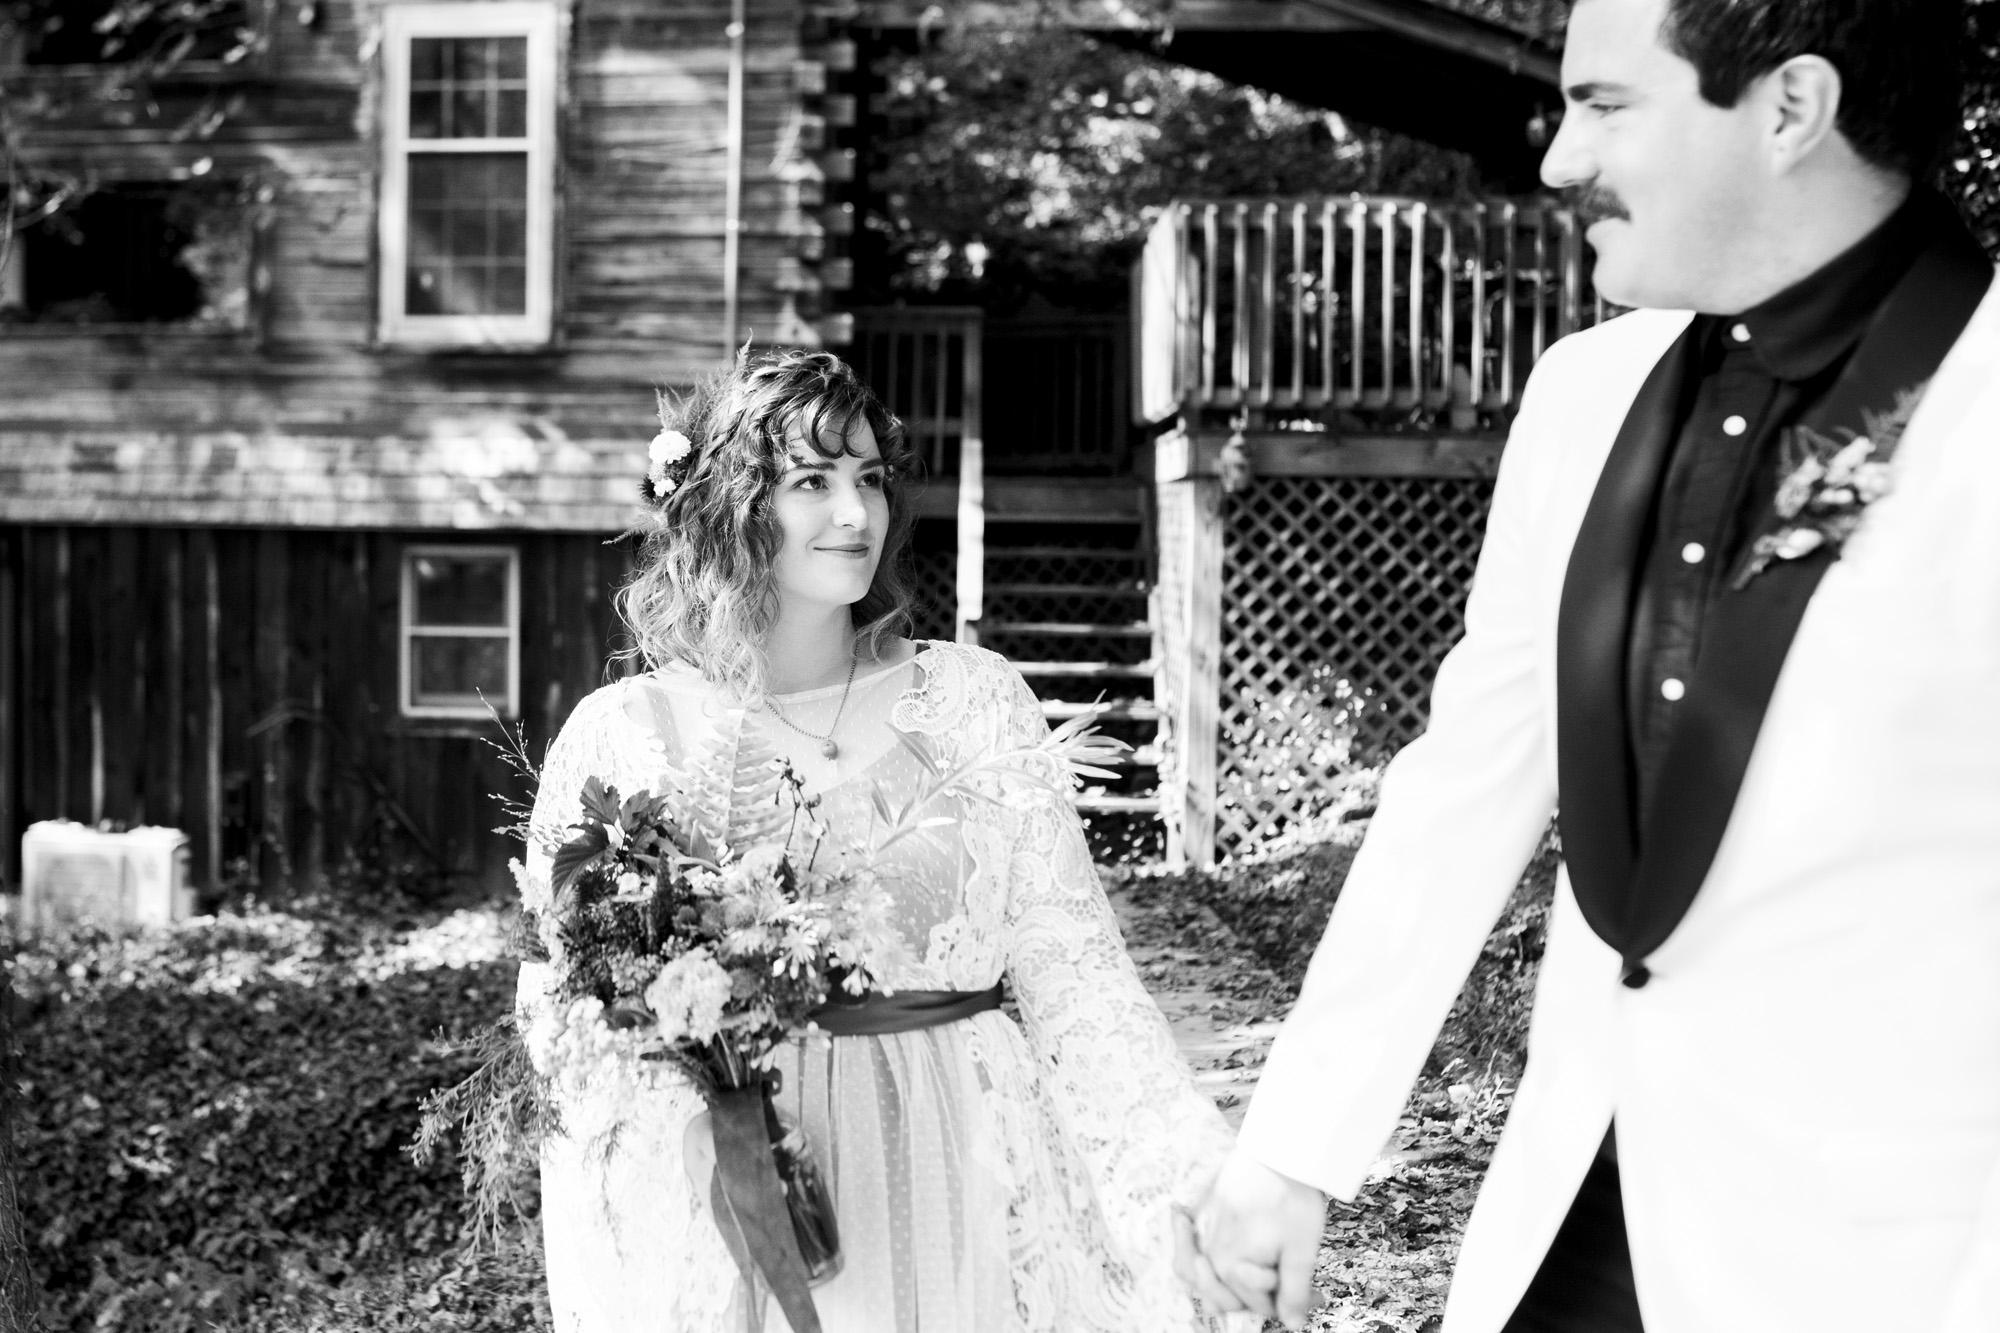 Seriously_Sabrina_Photography_Red_River_Gorge_Kentucky_Wedding_ShawnDana75.jpg